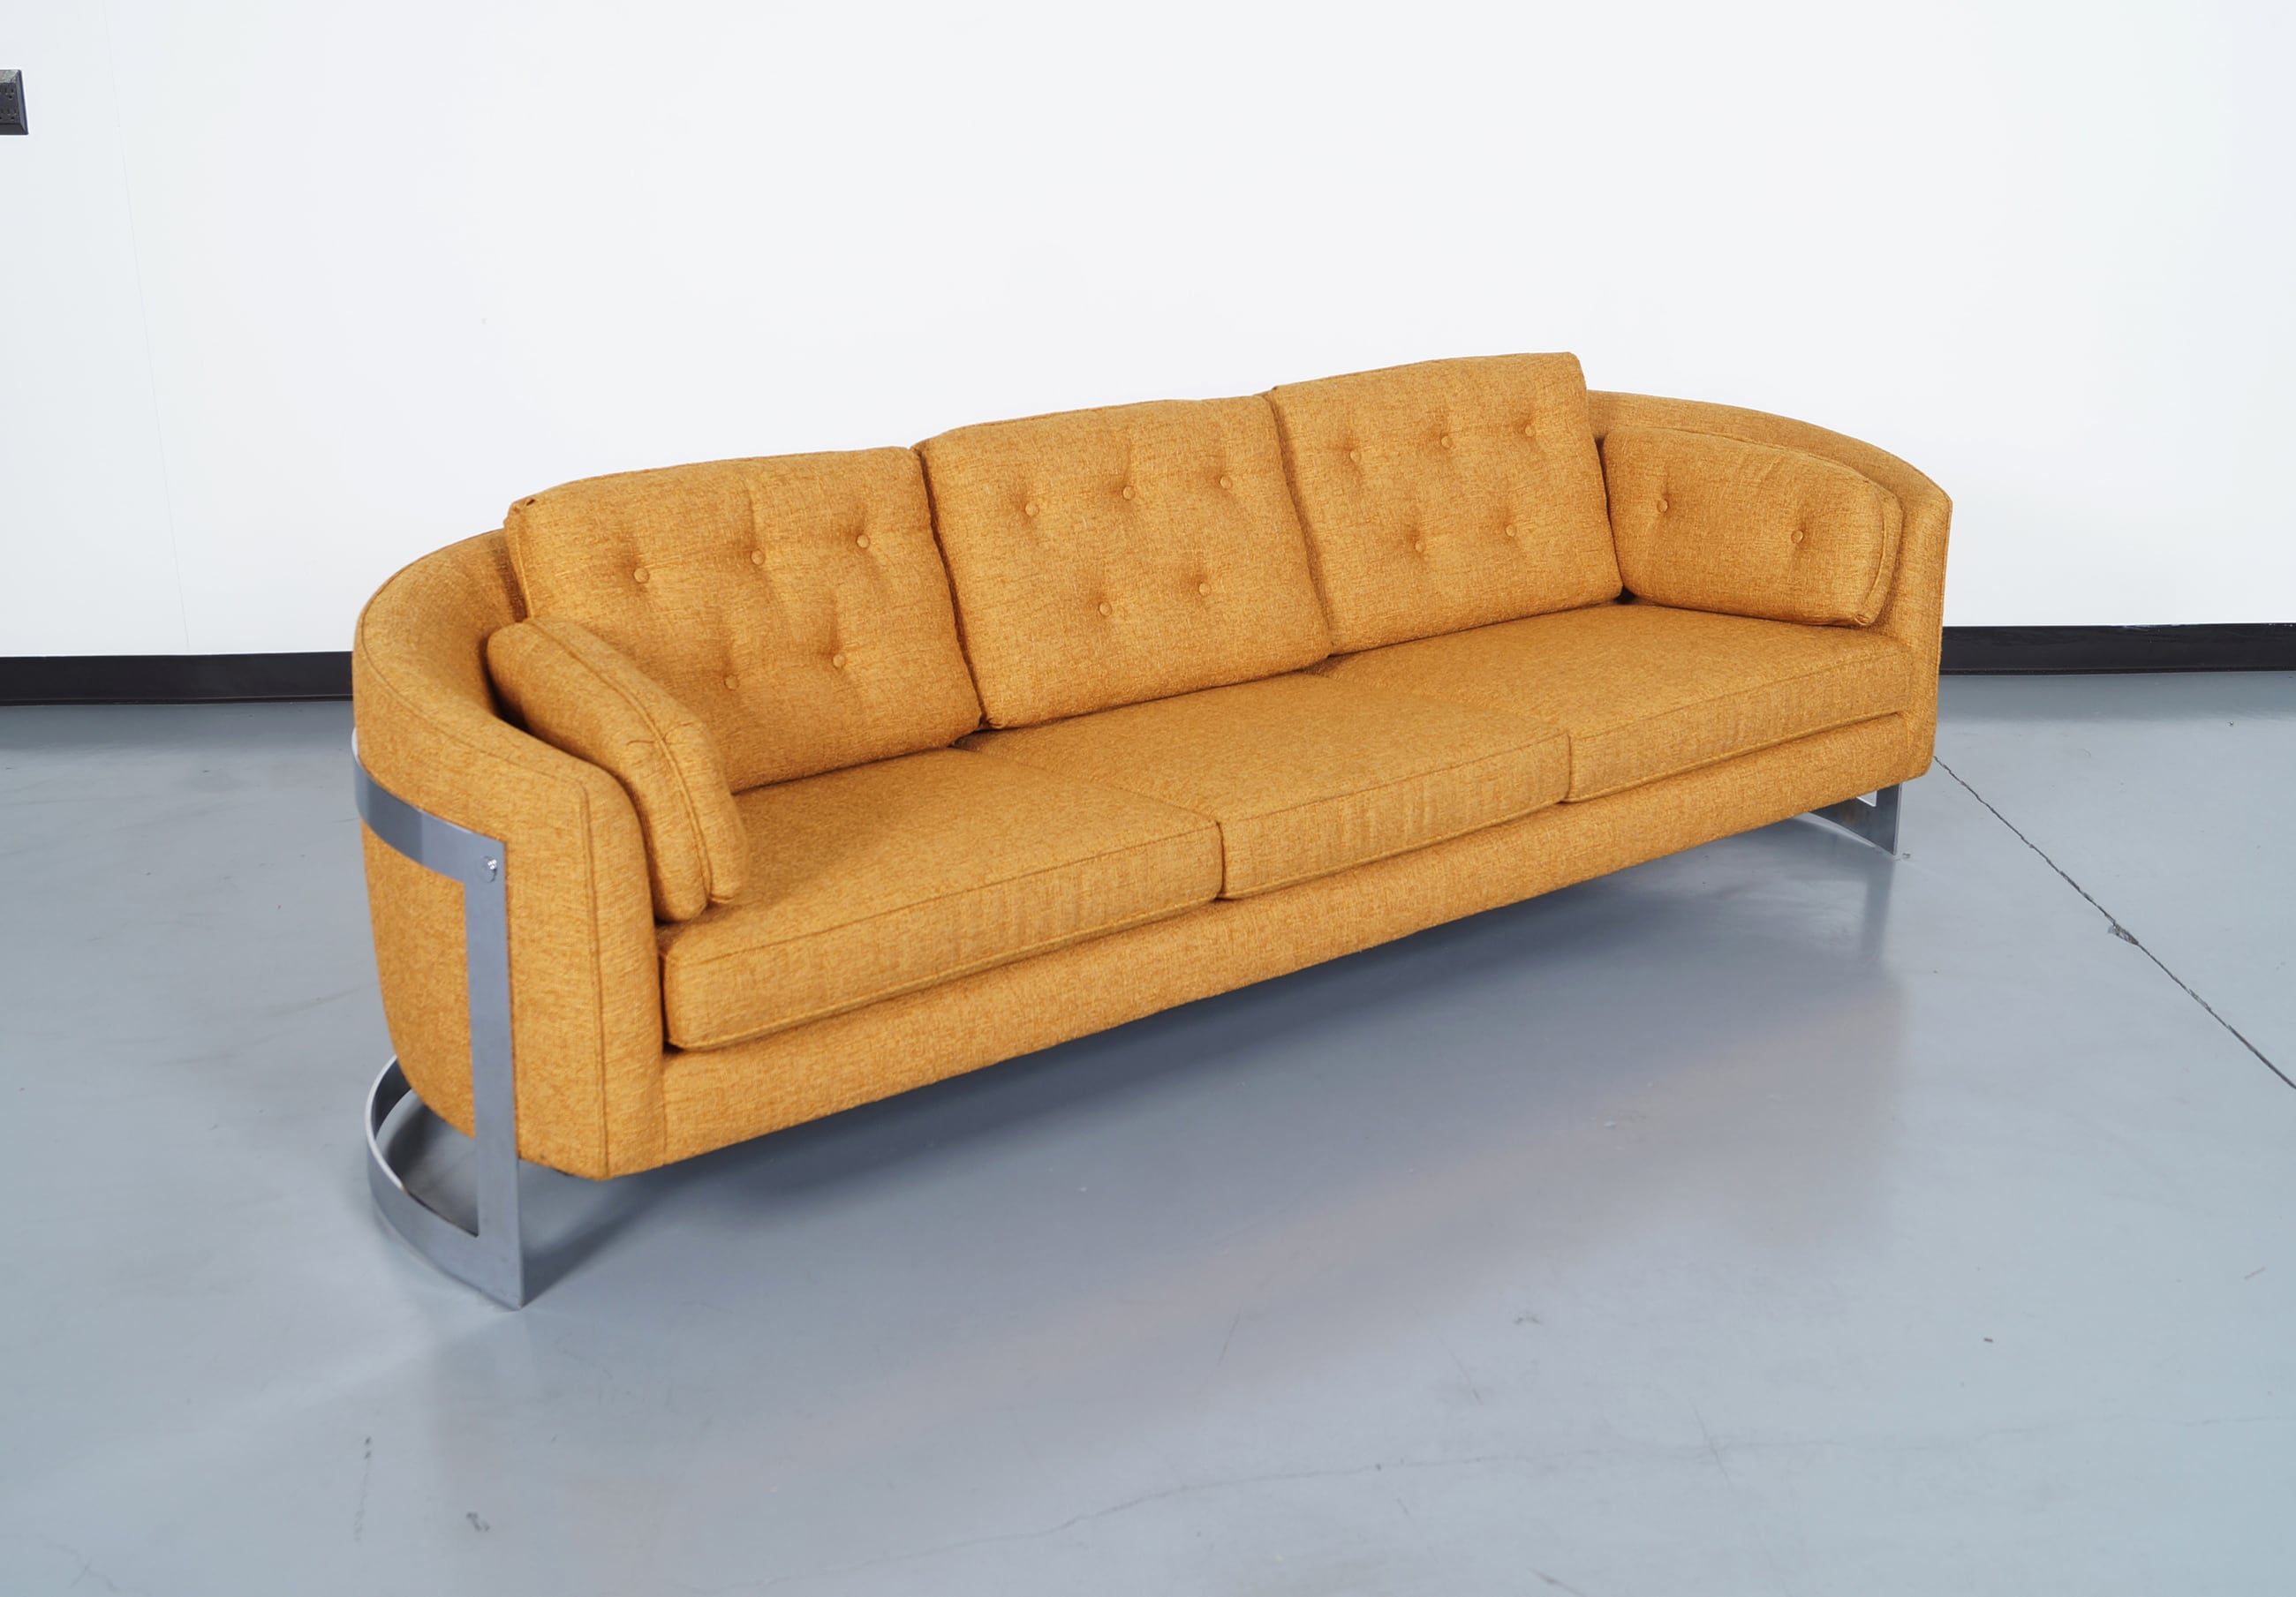 Vintage Floating Chrome Sofa by Milo Baughman